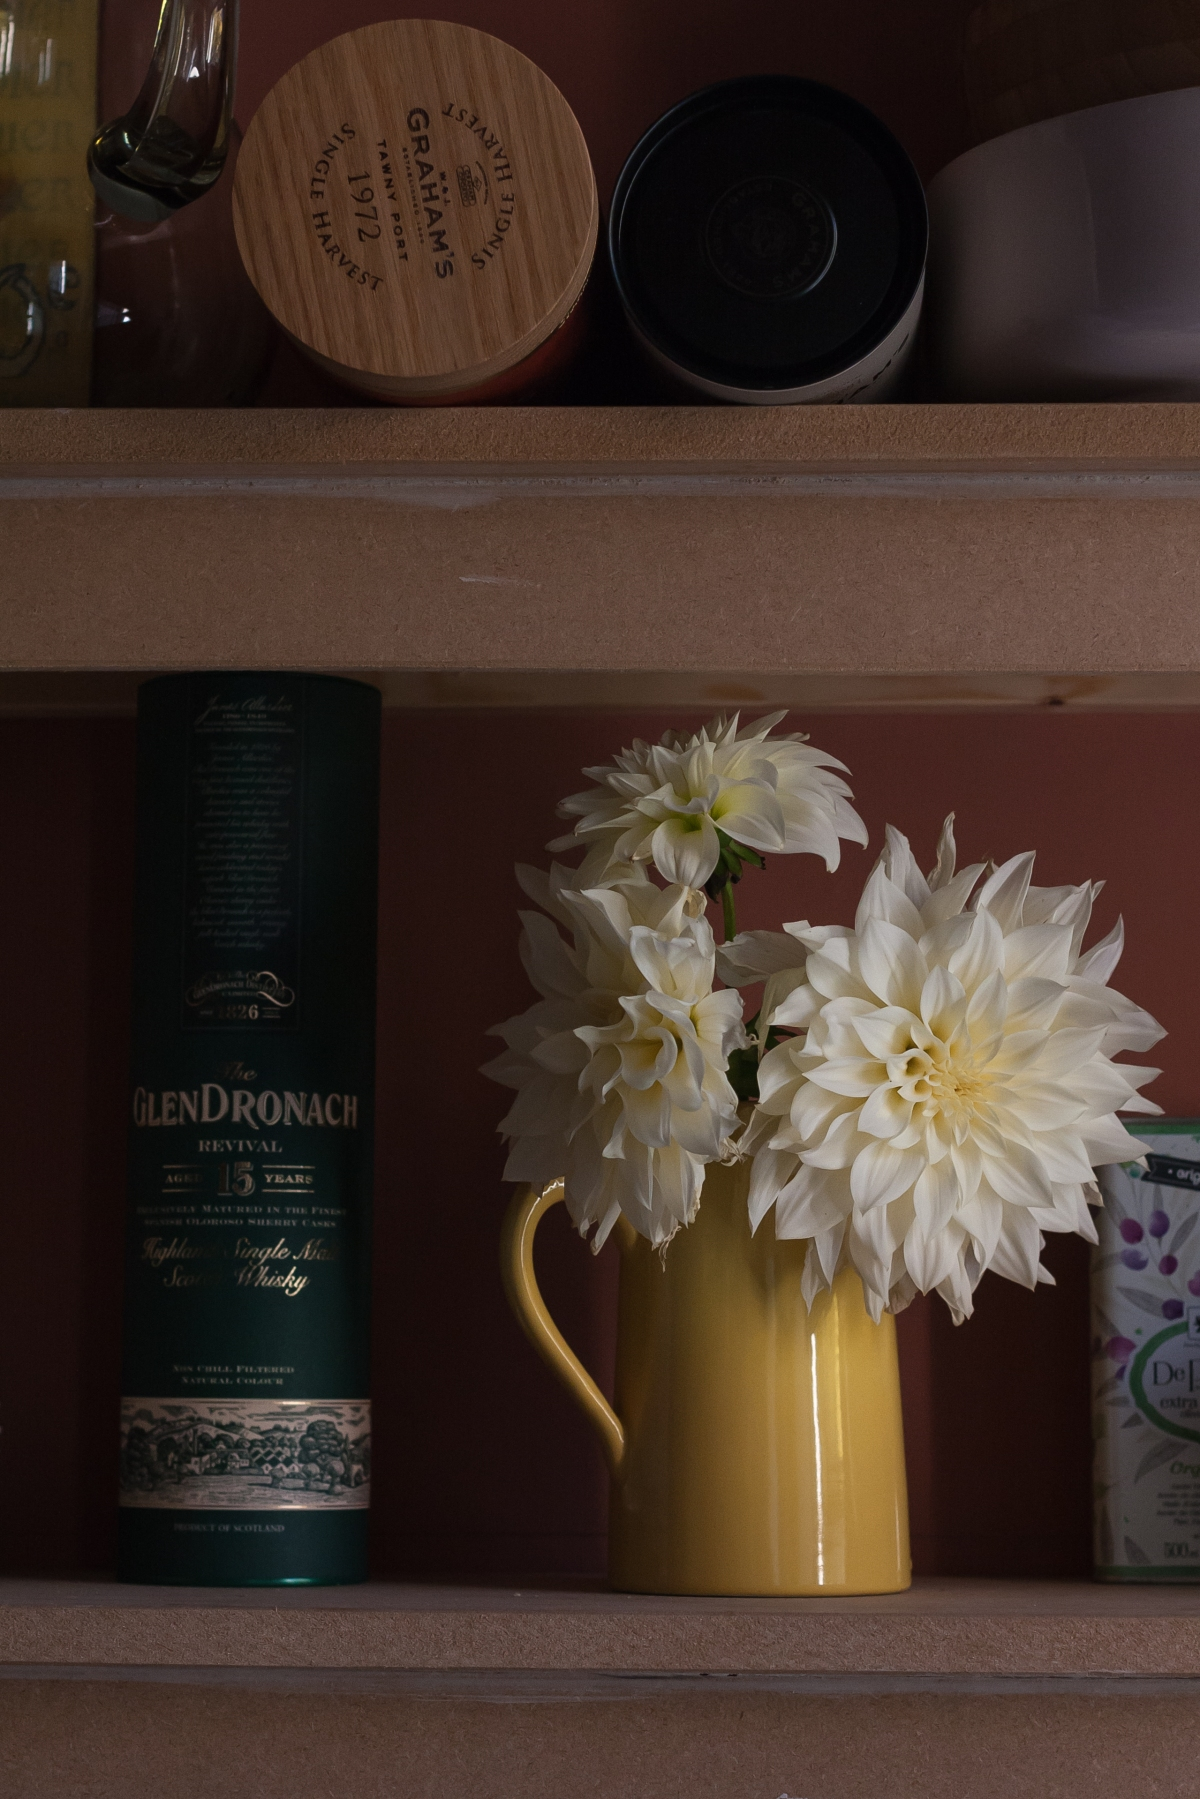 In a vase on Monday: Fading dahlias on an unpaintedshelf